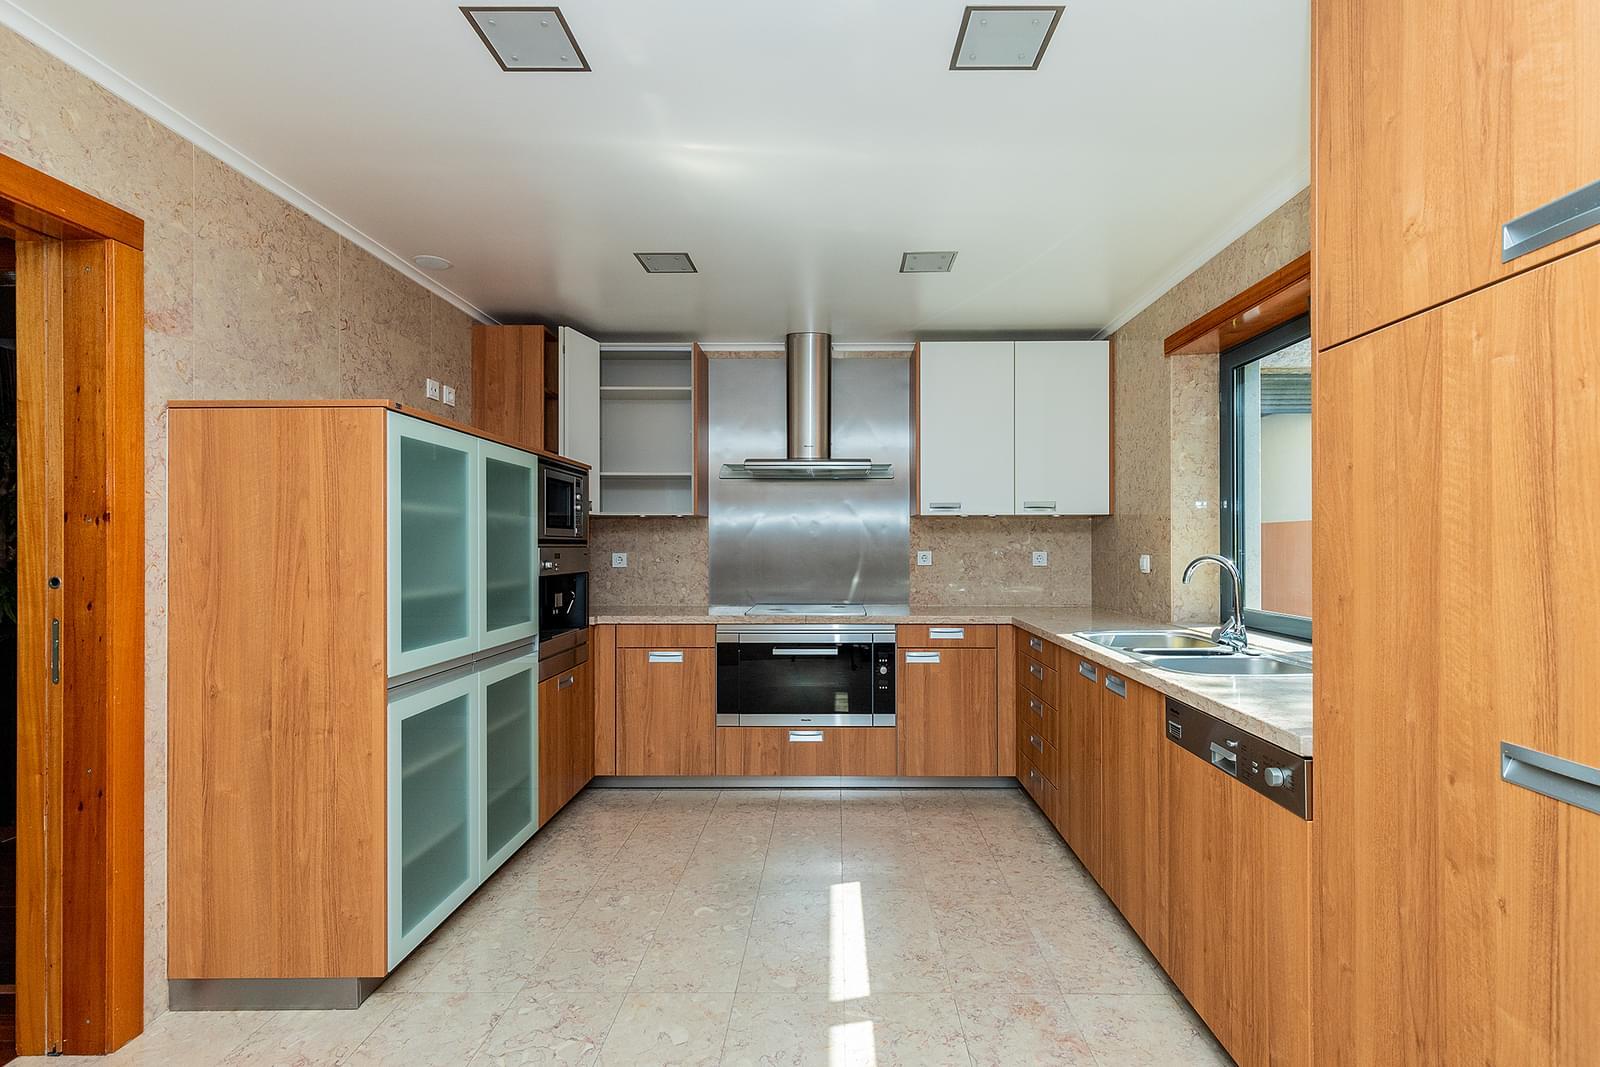 PF17921, Maison normal T5, ALMADA